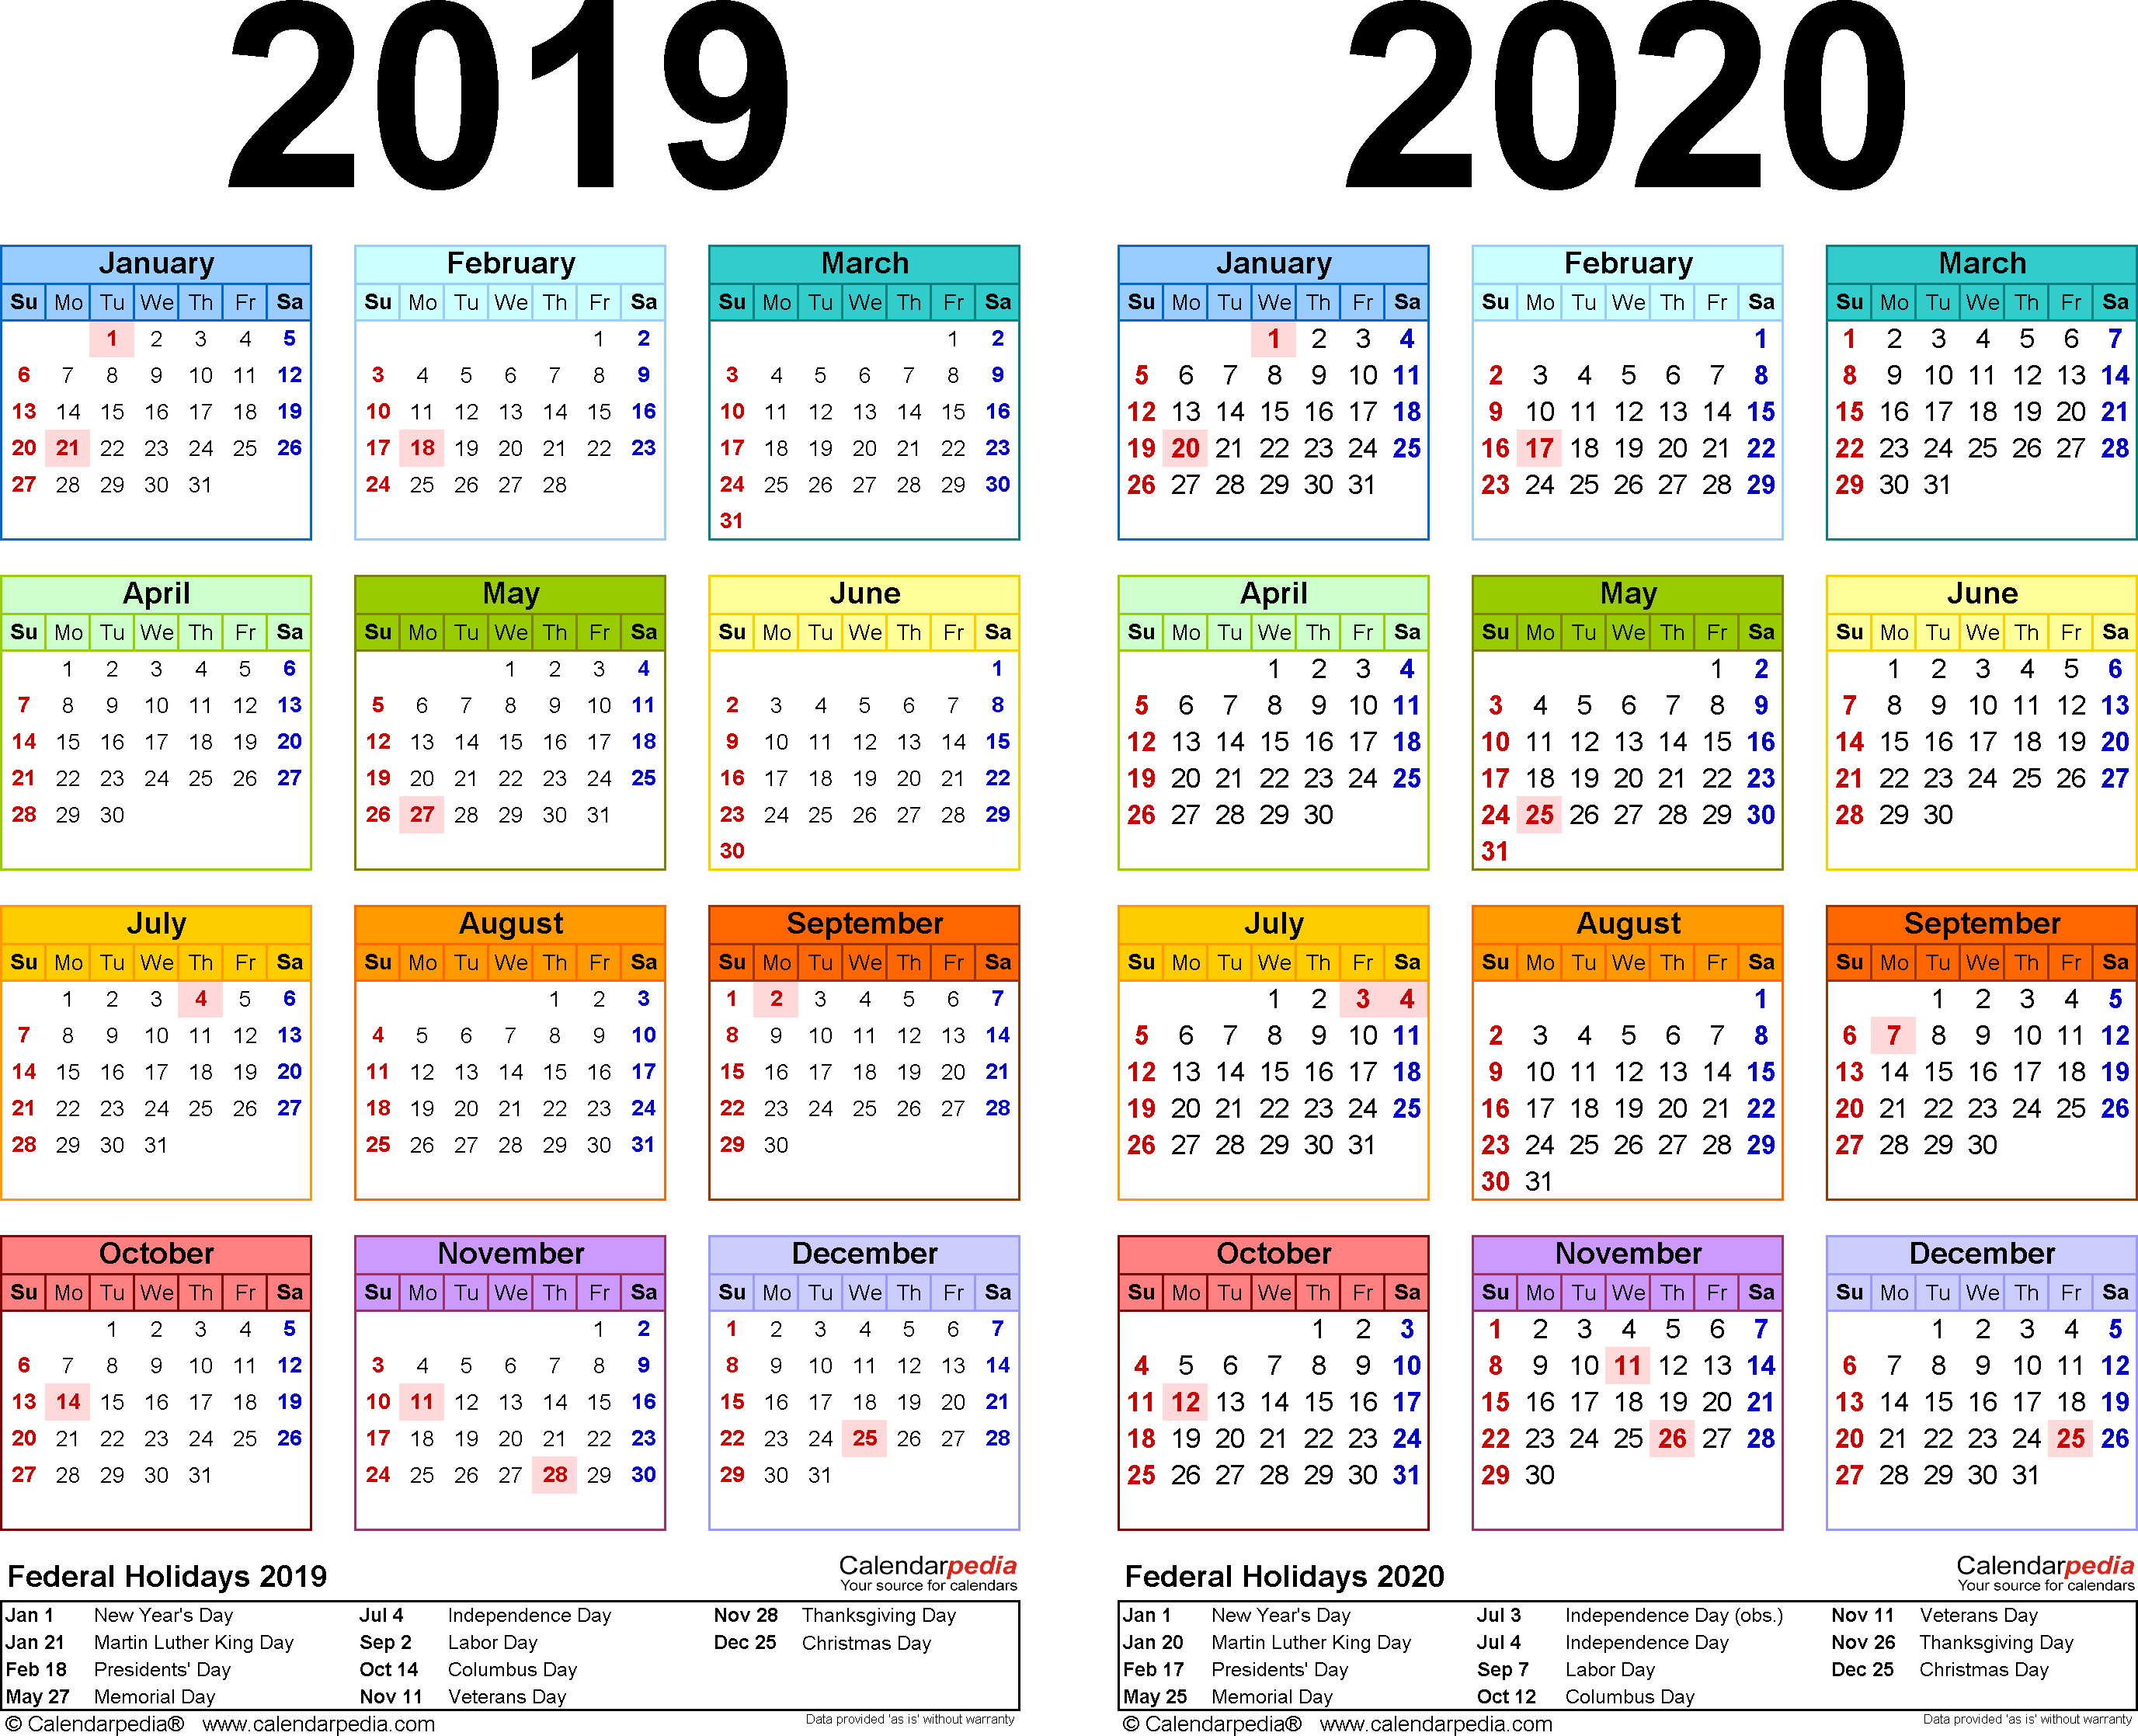 2019-2020 Calendar - Free Printable Two-Year Pdf Calendars inside Printable Yearly Calendar June 2019-2020